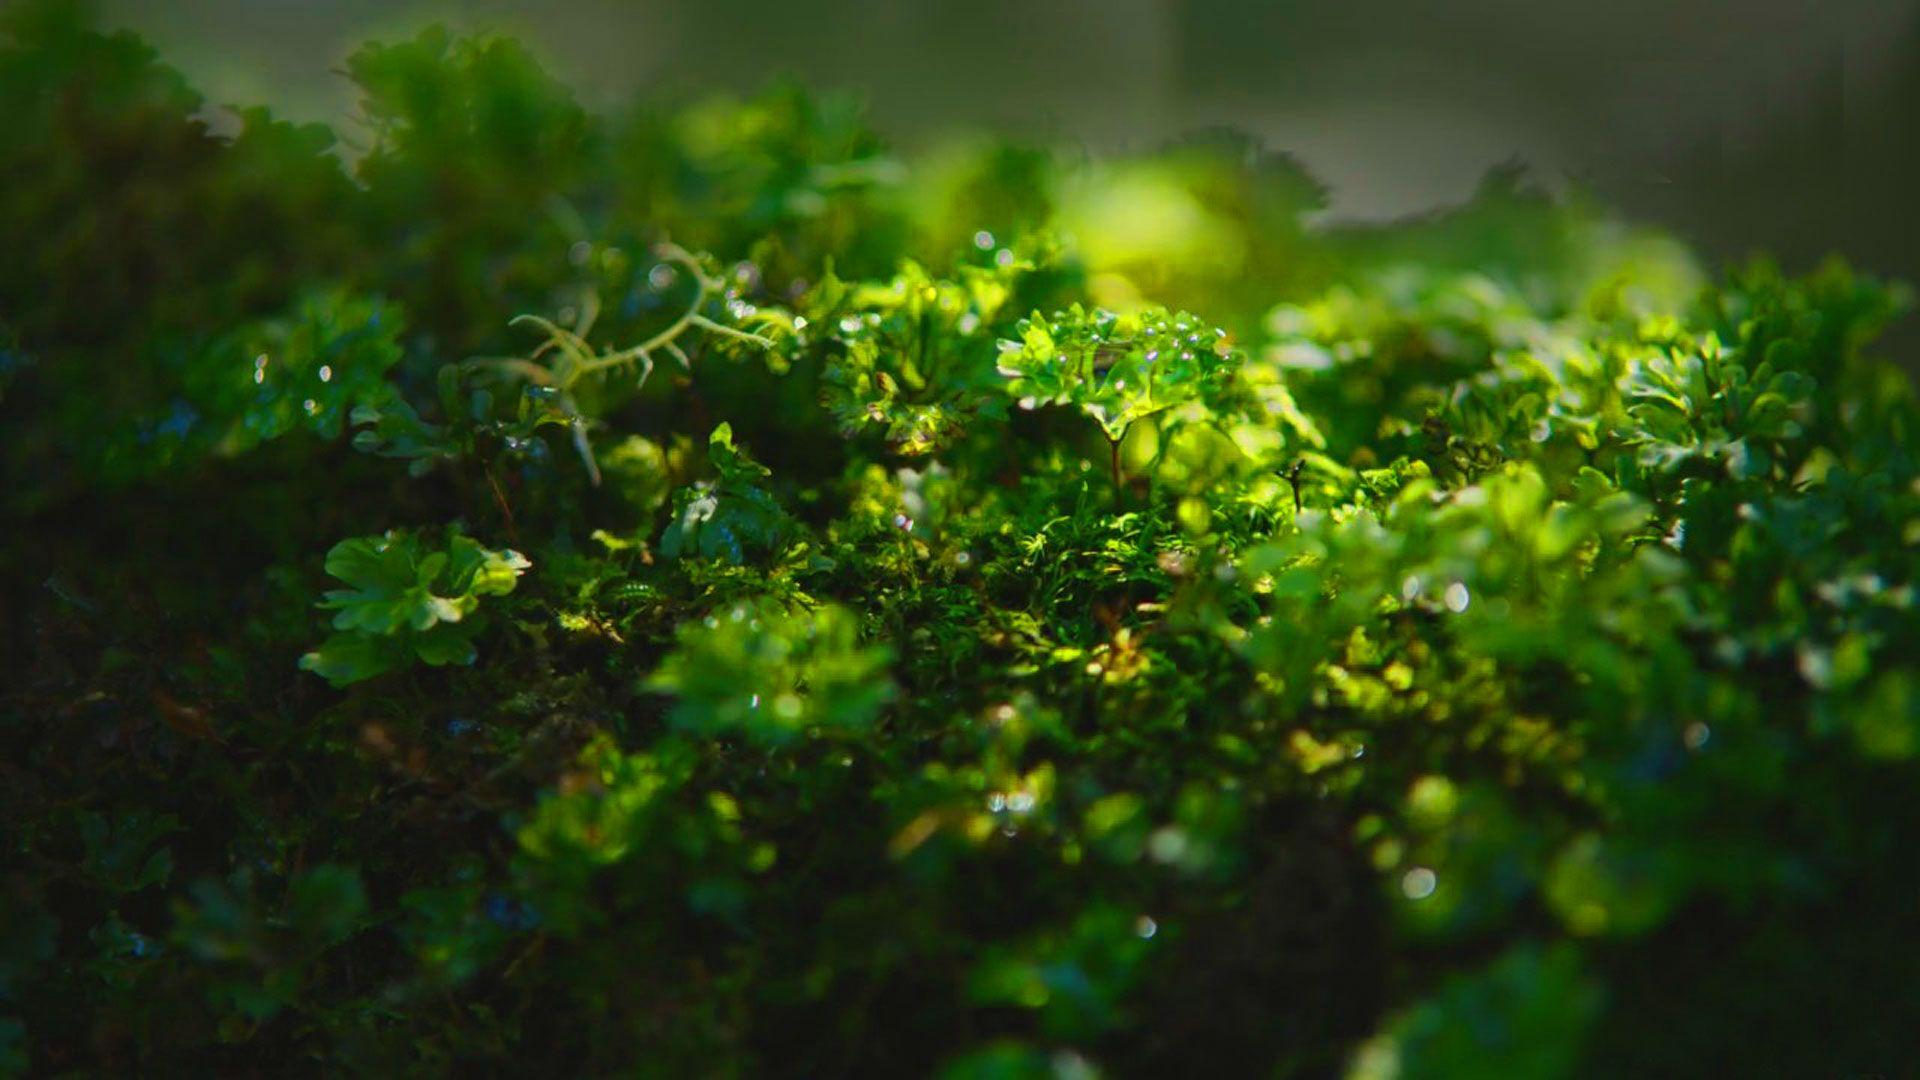 hd pics photos stunning attractive nature green small plants macro closeup new hd desktop background wallpaper